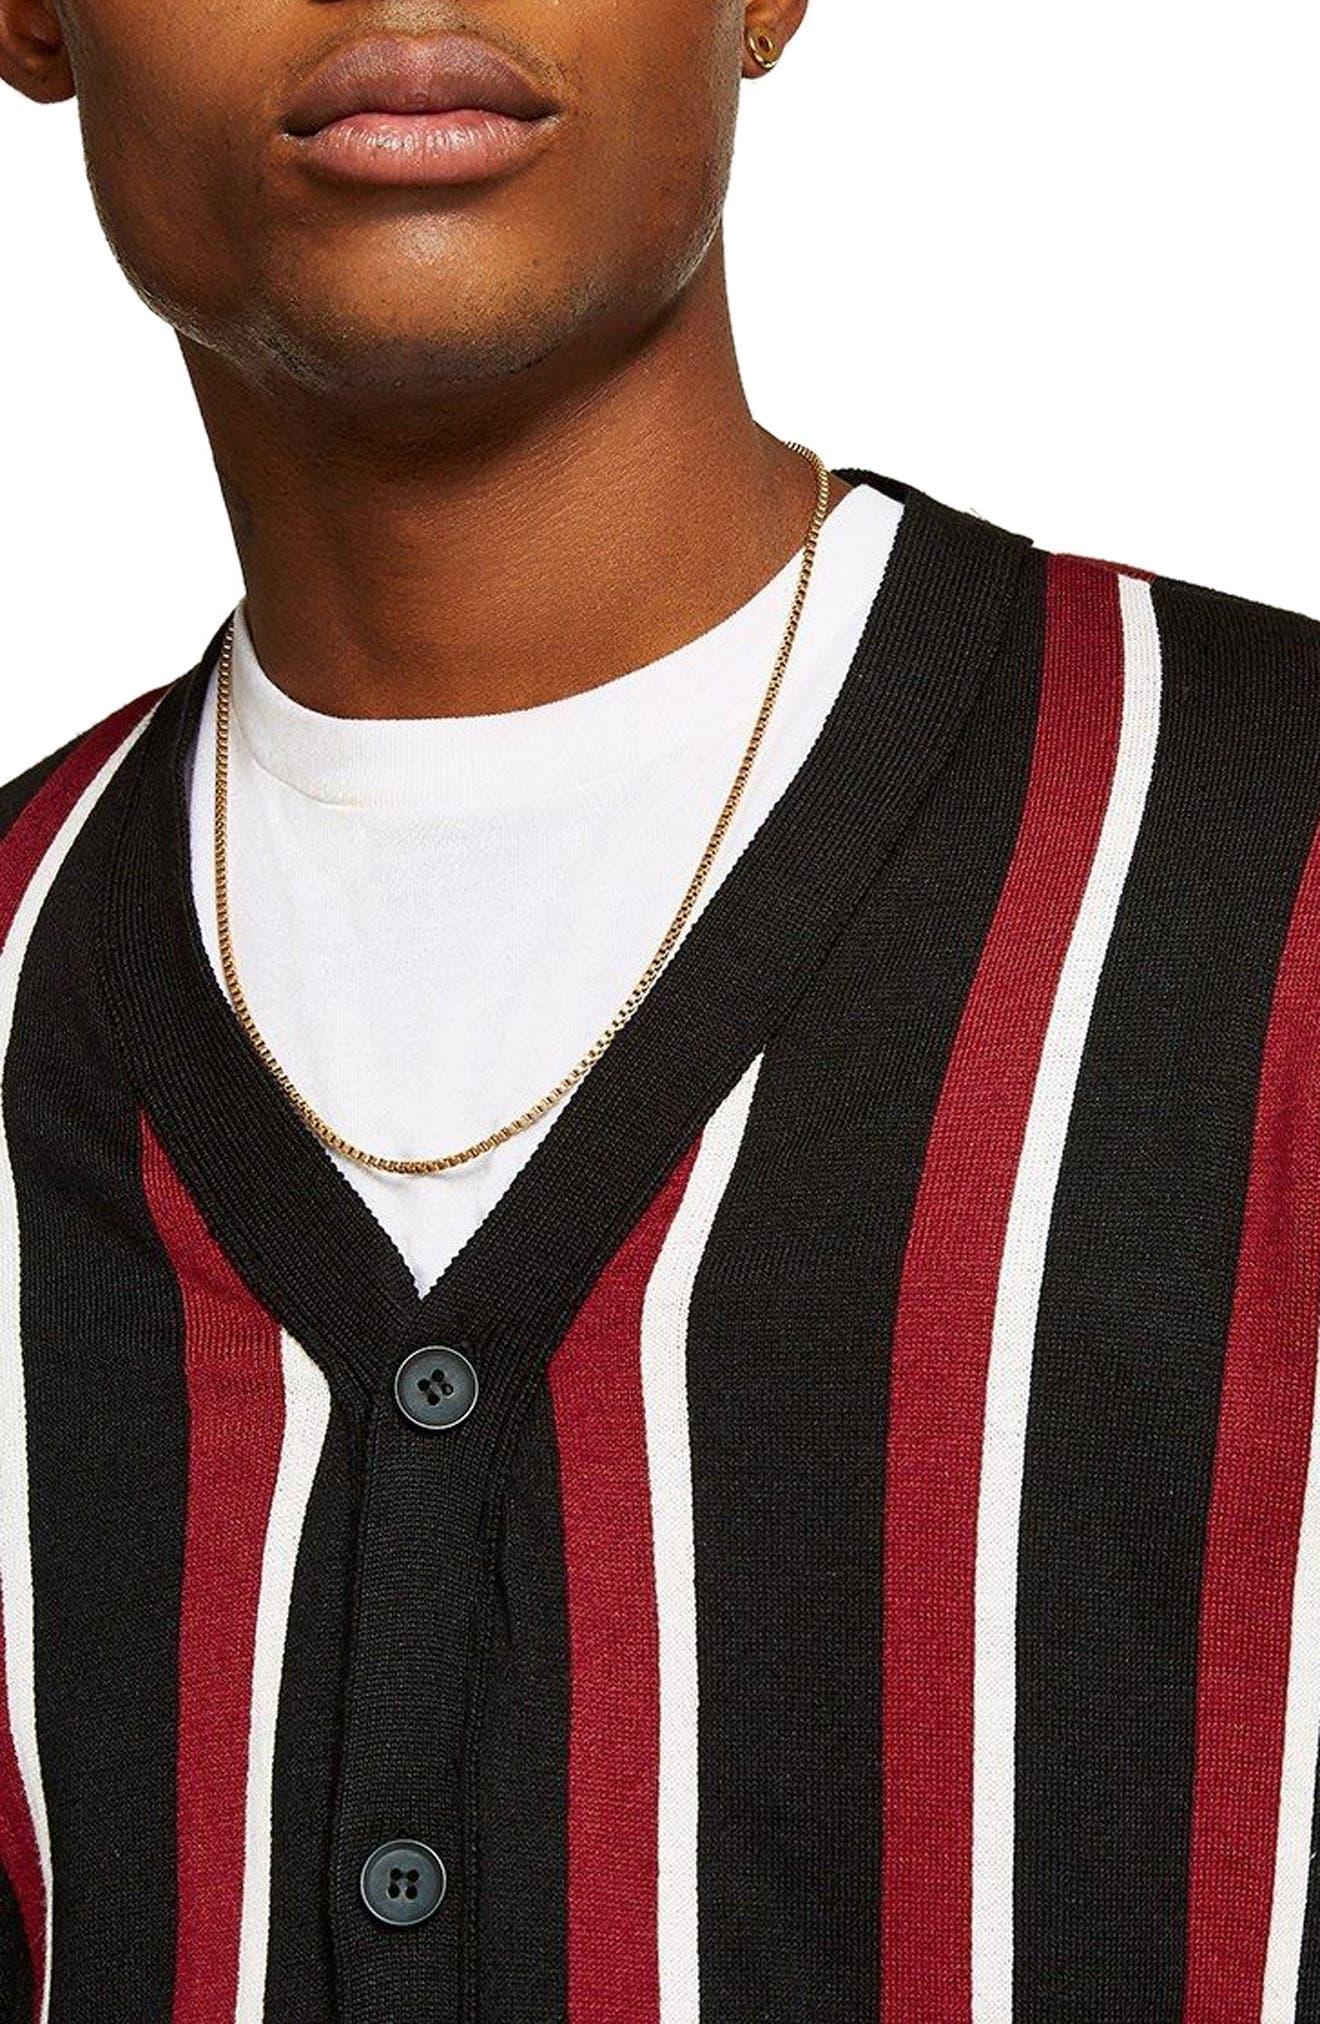 Slim Fit Stripe Cardigan,                             Alternate thumbnail 3, color,                             Black Multi